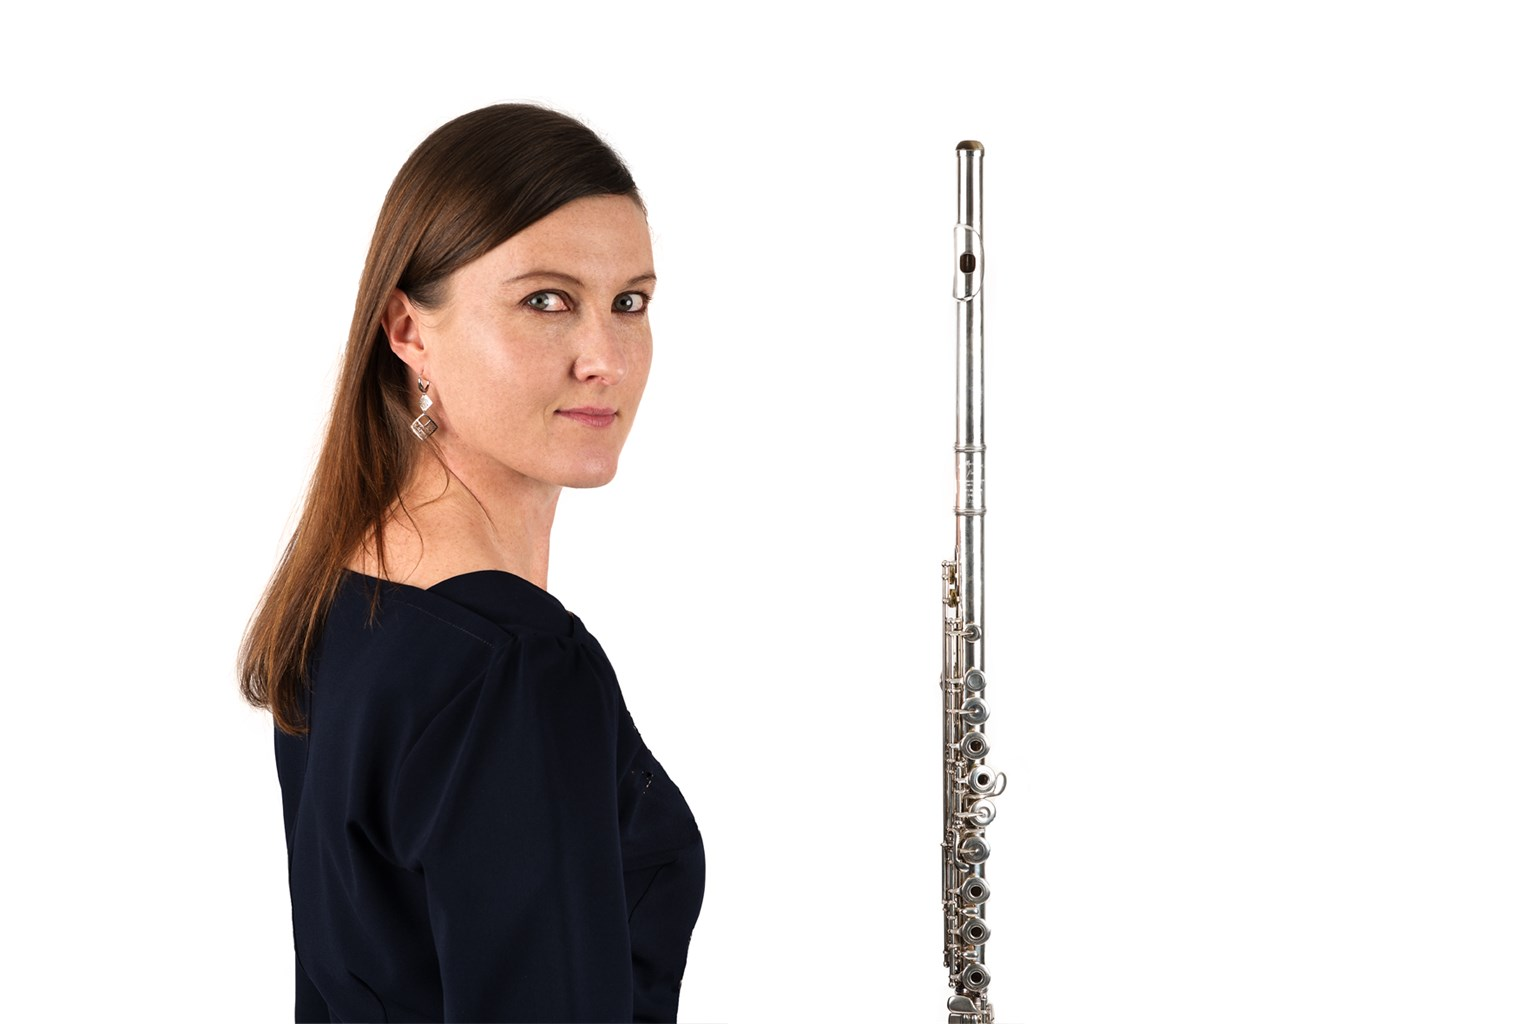 Melissa Doecke